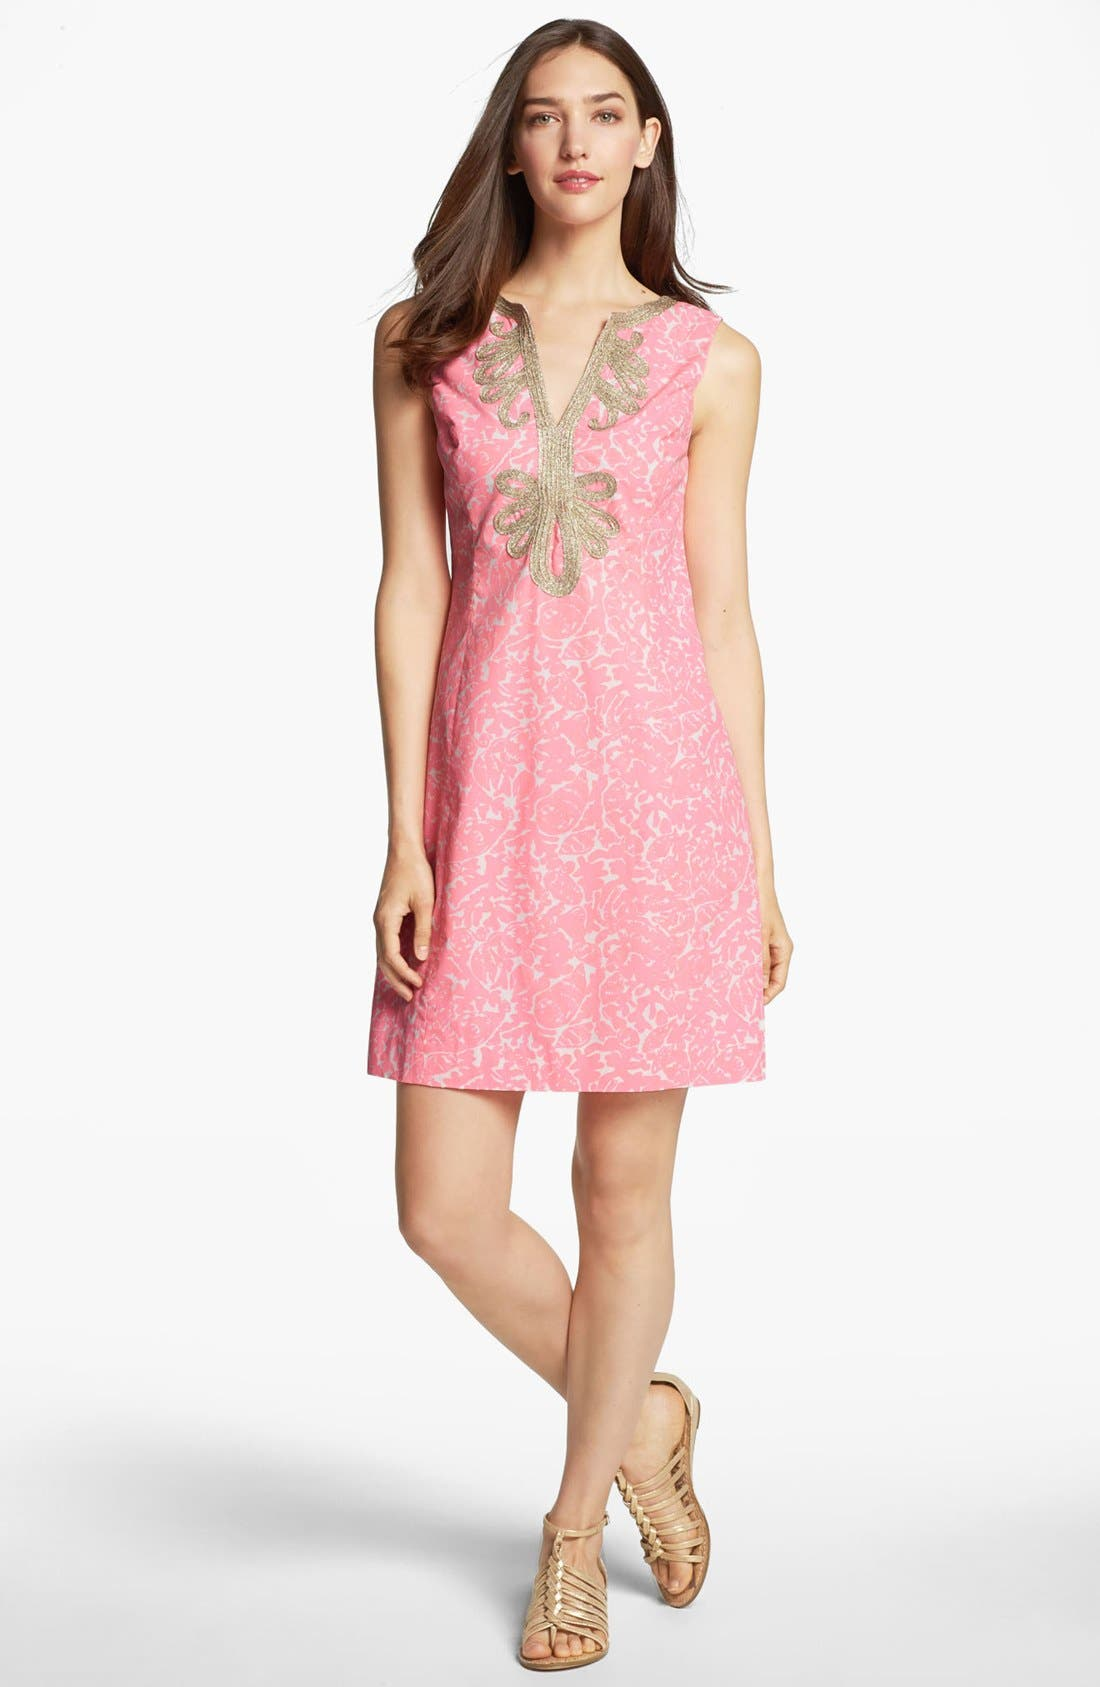 Alternate Image 1 Selected - Lilly Pulitzer® 'Janise' Embellished Print Shift Dress